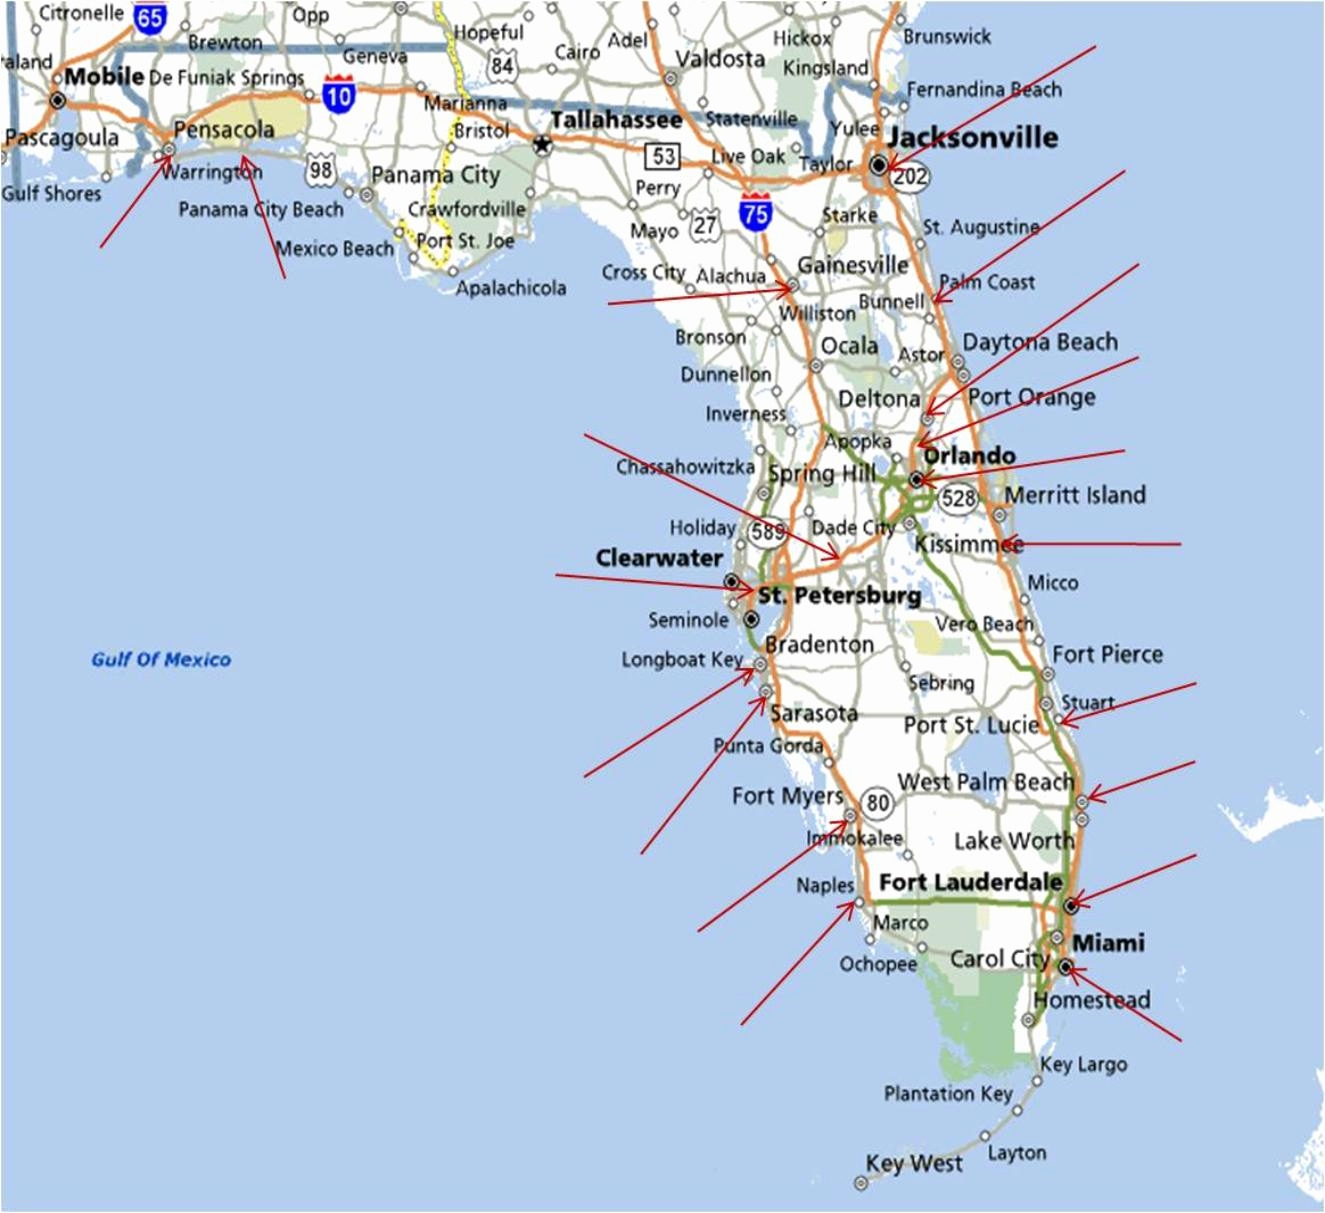 Best East Coast Florida Beaches New Map Florida West Coast Florida - Map Of Florida East Coast